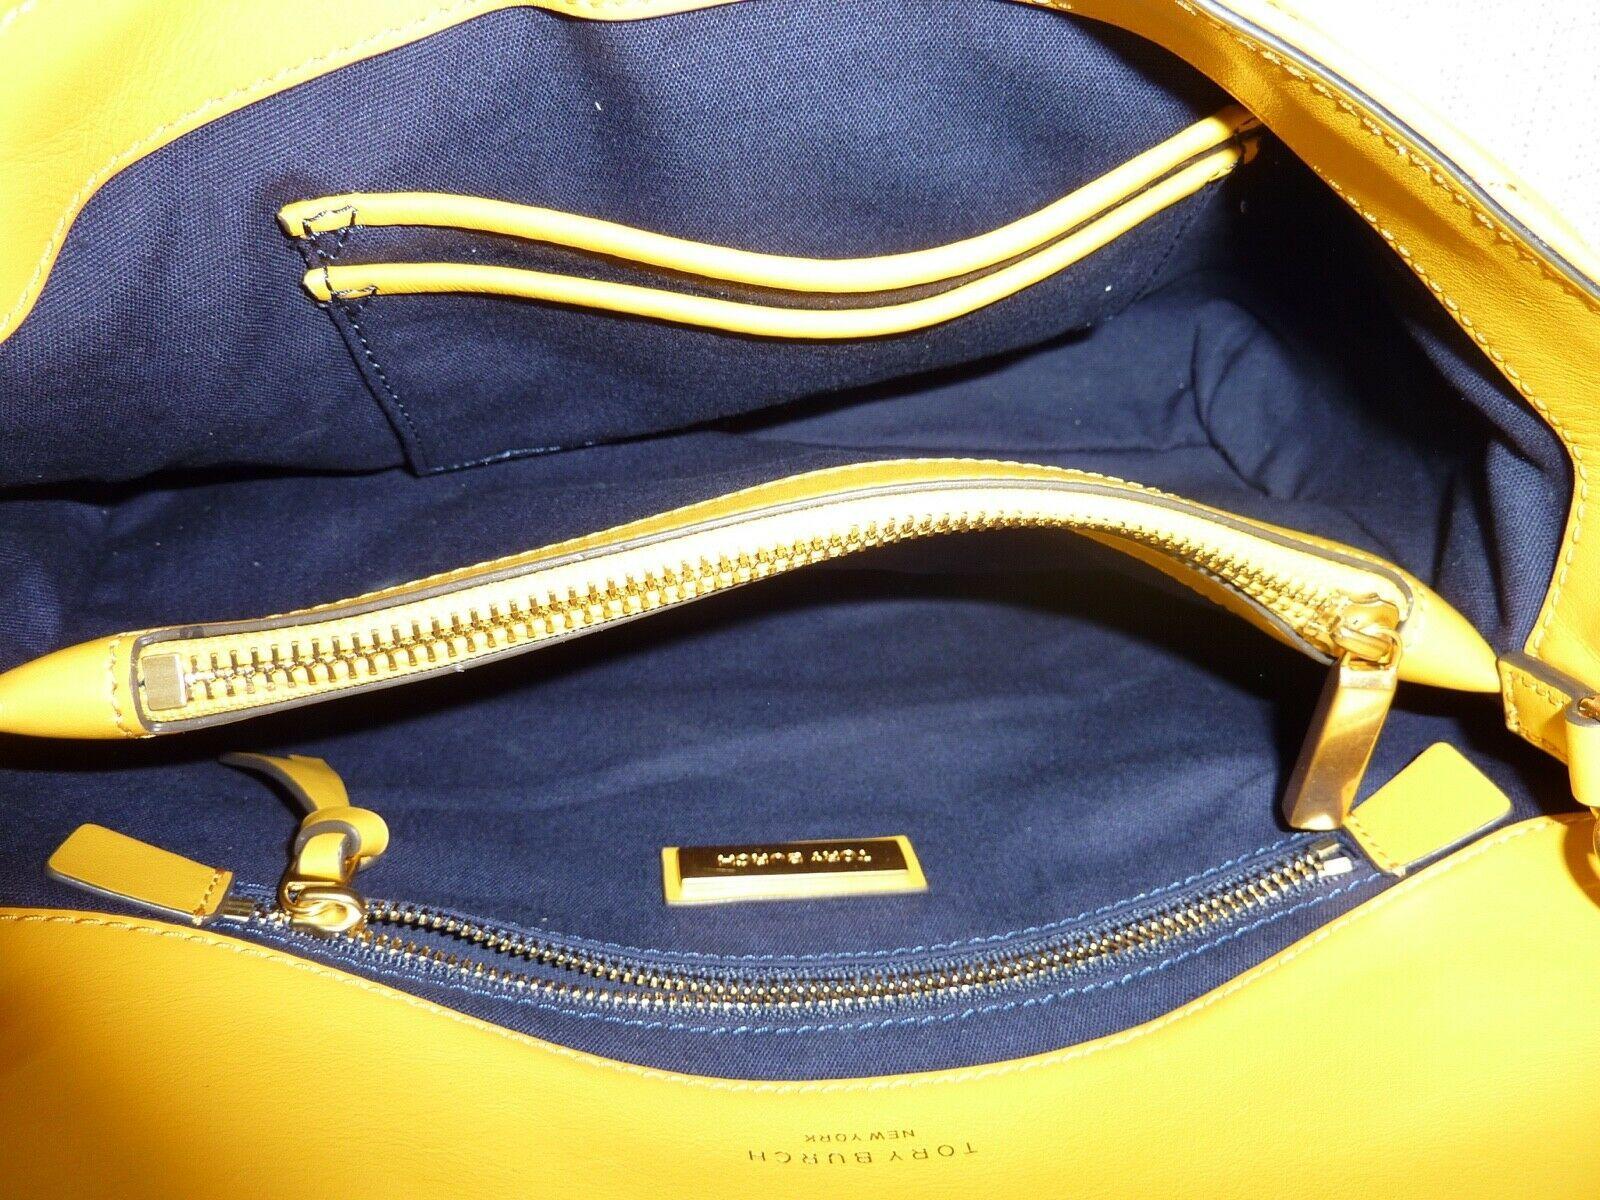 NWT Tory Burch Daylily Kira Chevron Flap Shoulder Bag $528 image 9